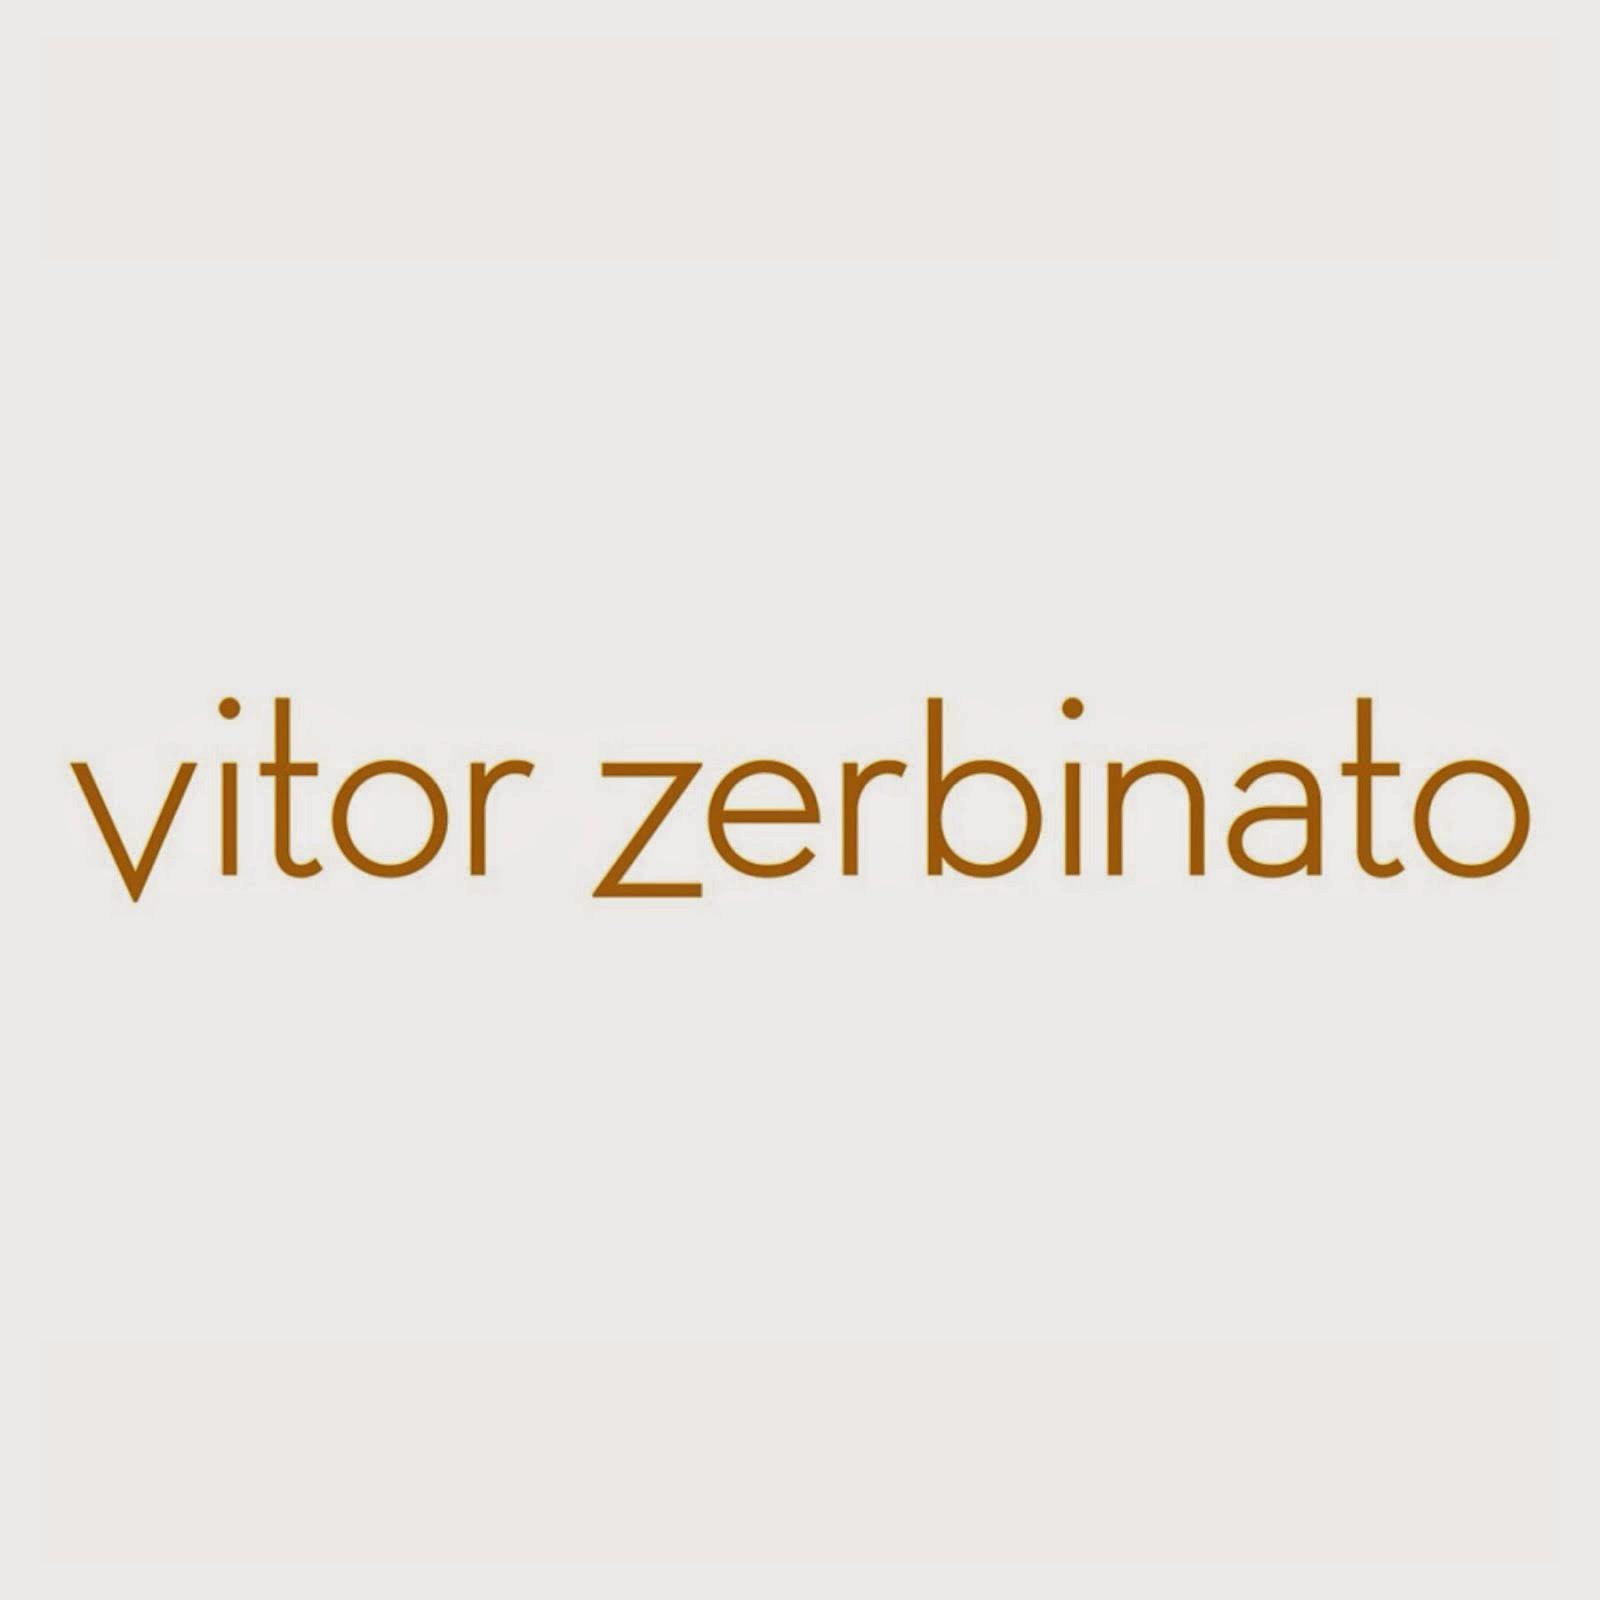 Vitor Zerbinato